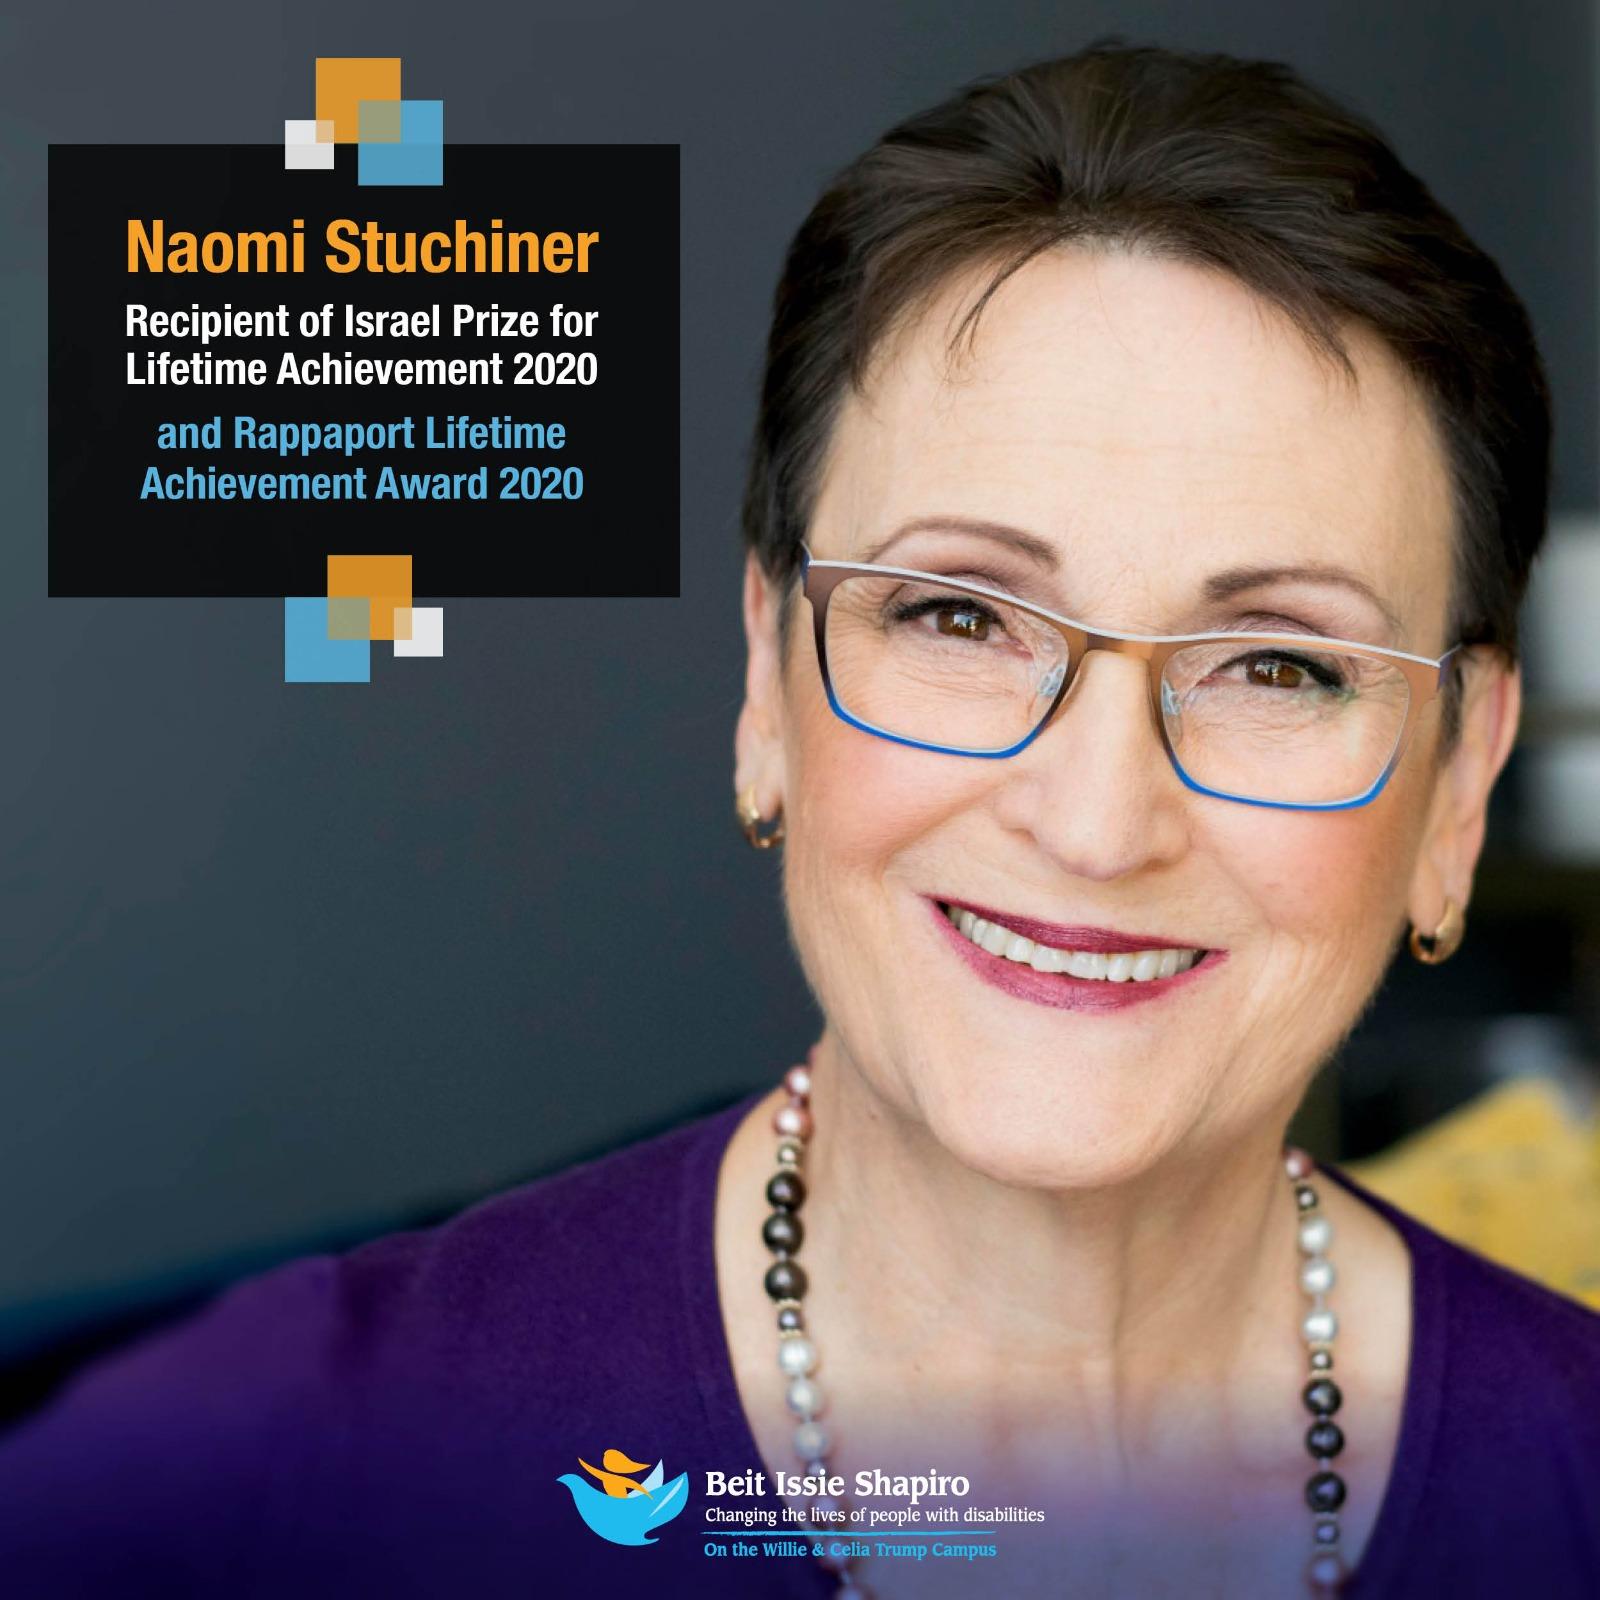 Israel Prize for Lifetime Achievement Awarded to Beit Issie Shapiro Founder, Naomi Stuchiner